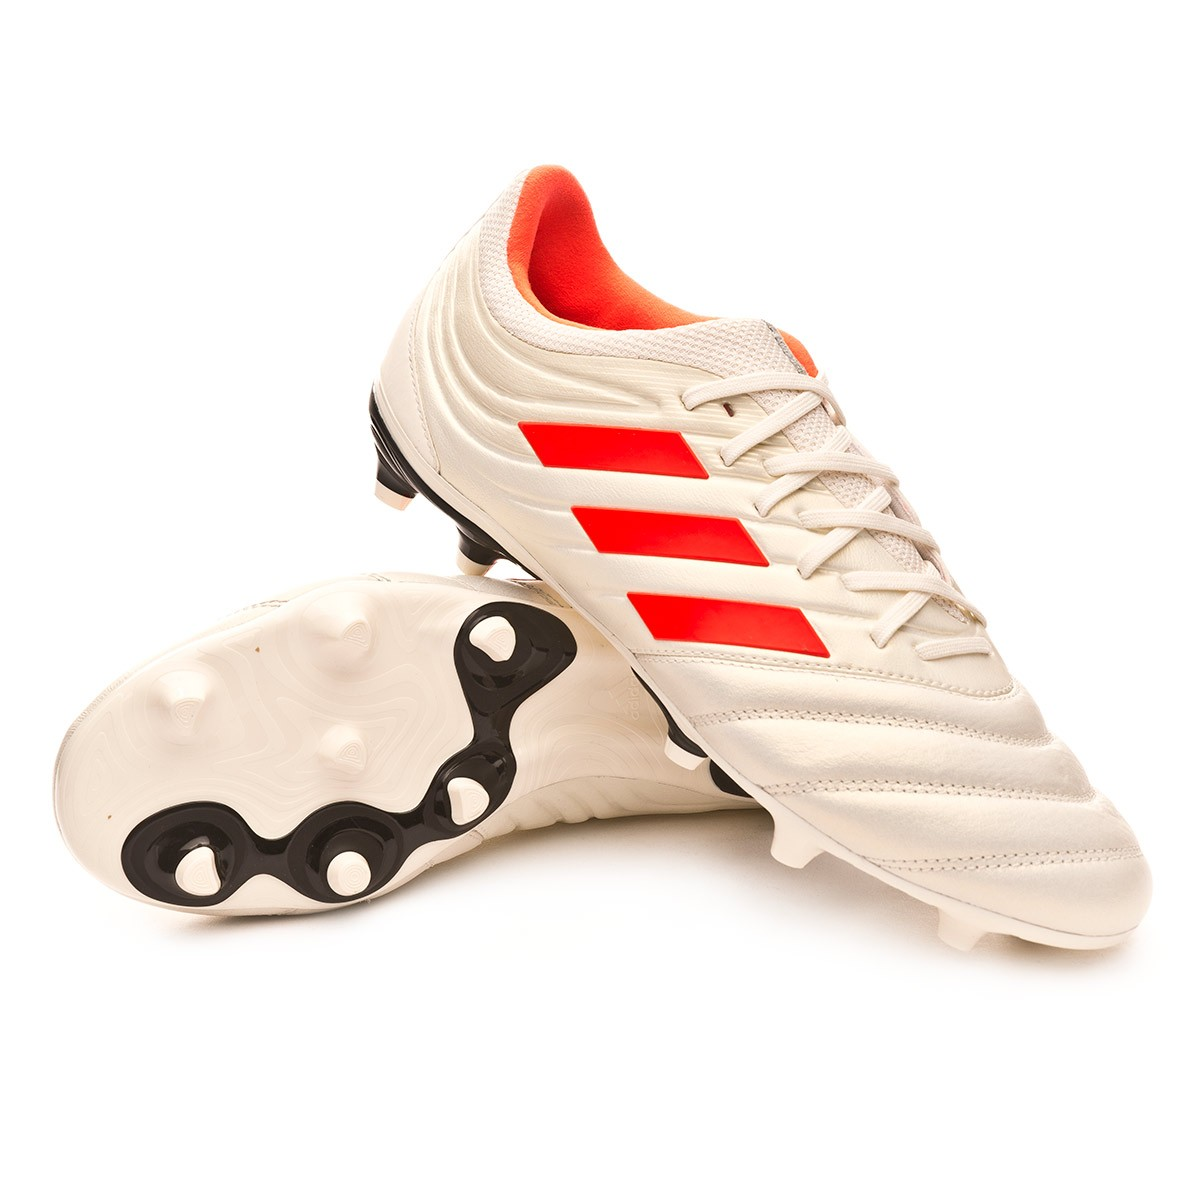 Football Boots adidas Copa 19.3 FG Off